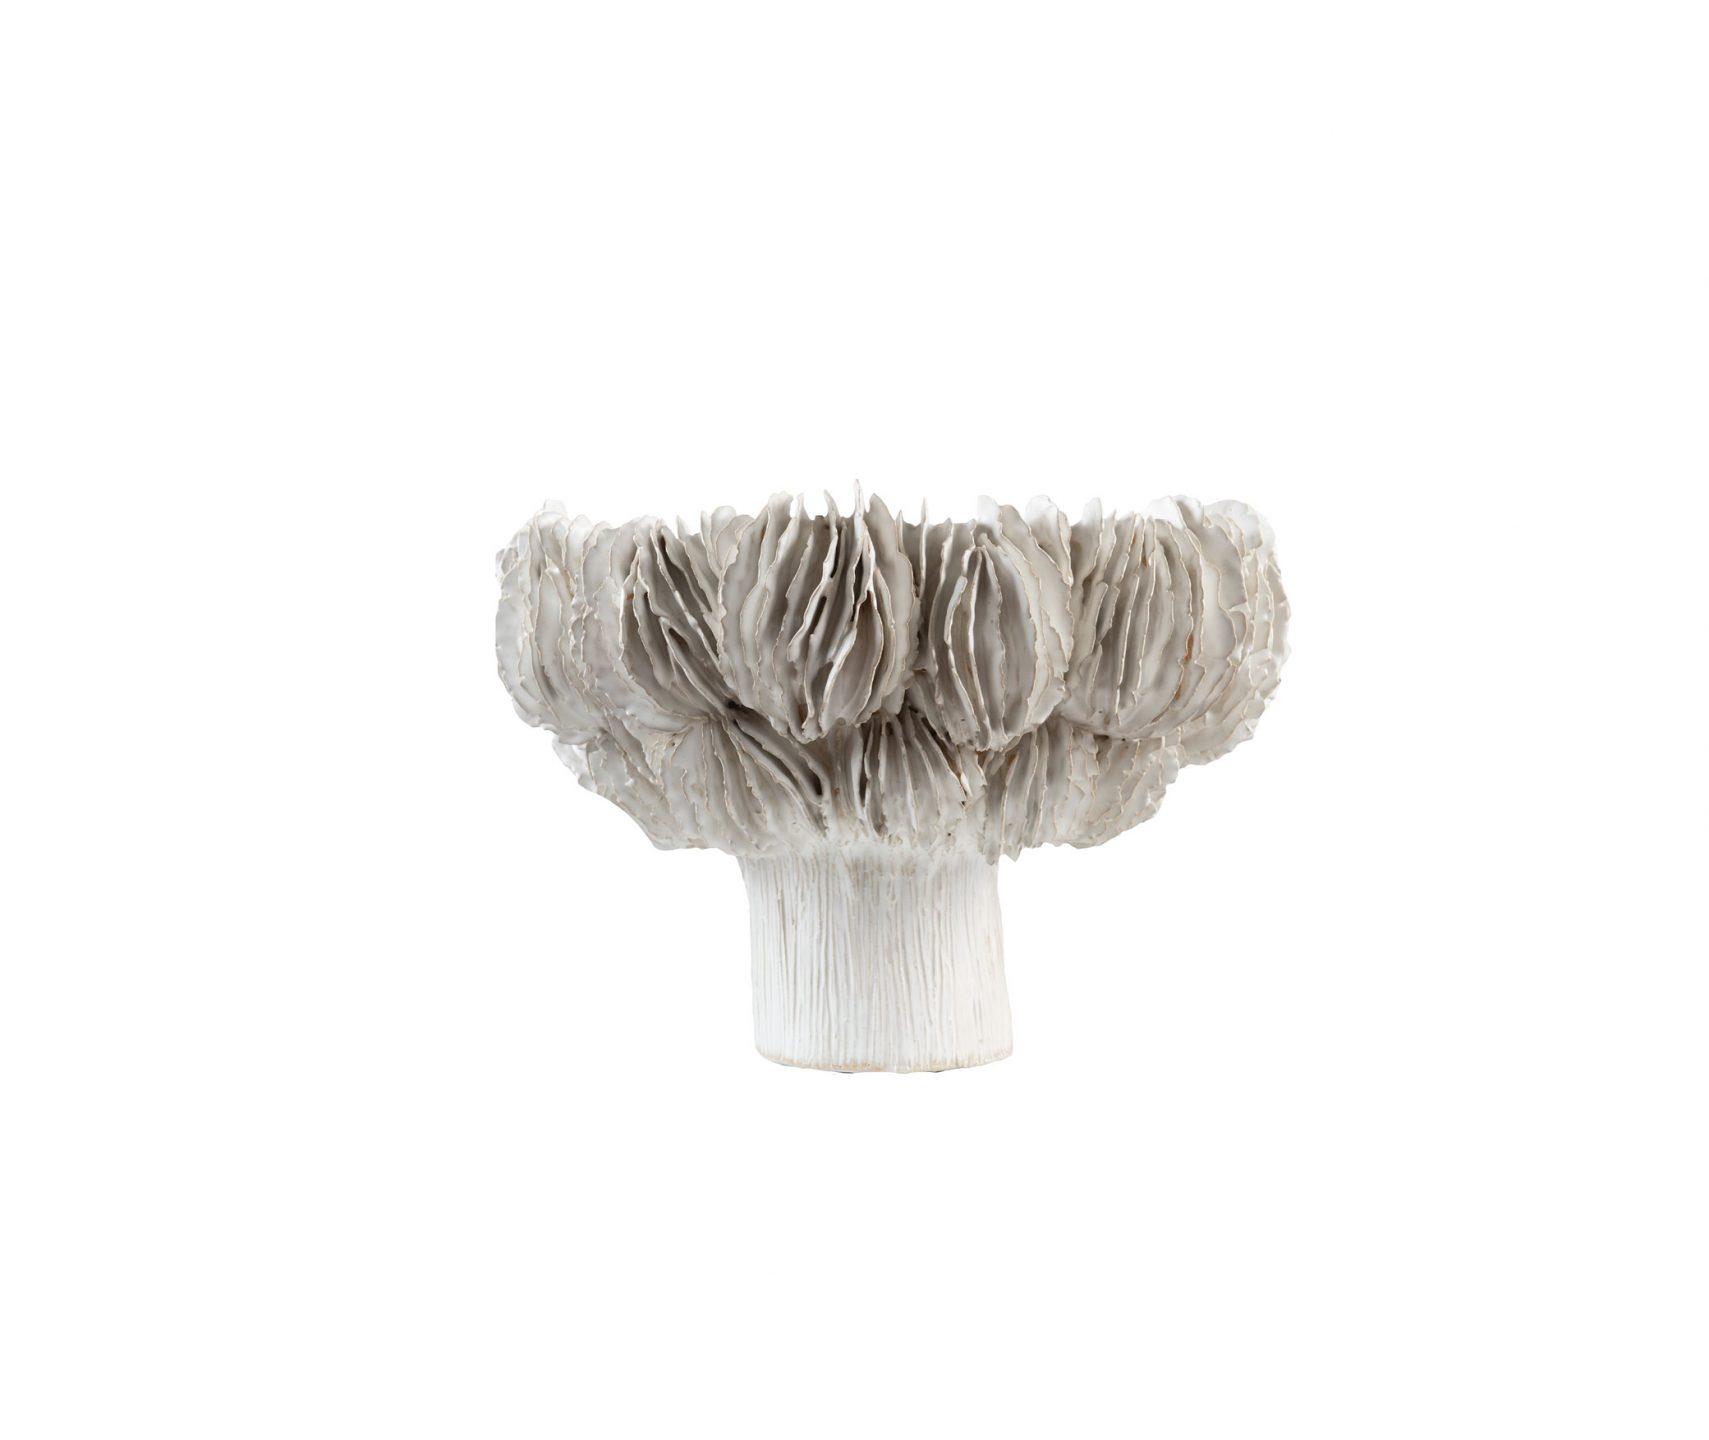 Wexler_Lamella-Pedestal-Bowl-1_int_products